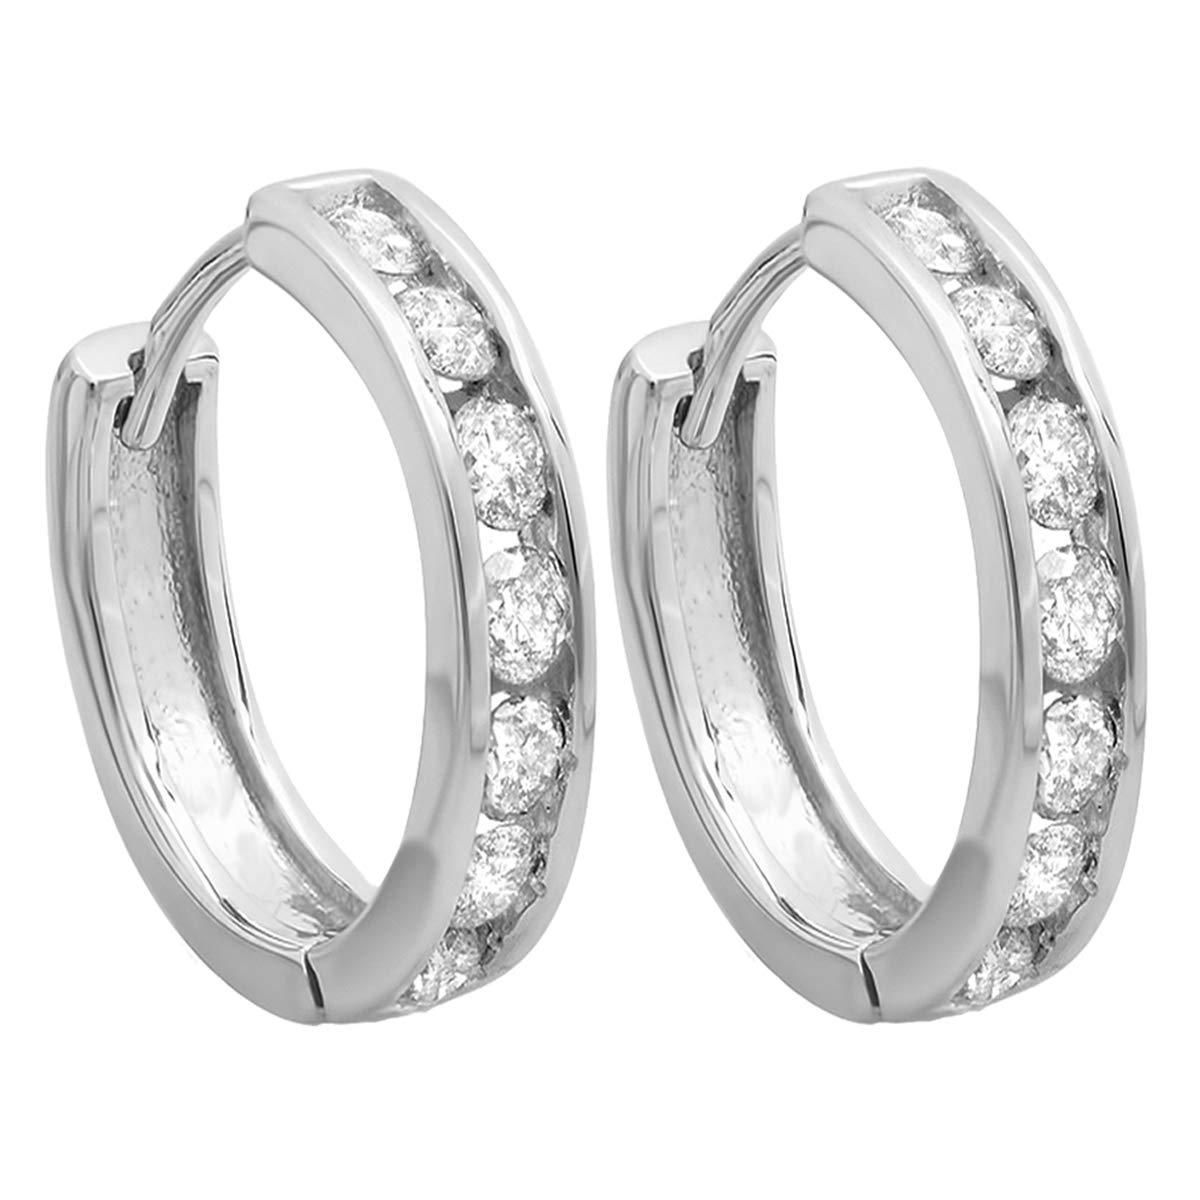 Dazzlingrock Collection 0.50 Carat (ctw) 10K Round Diamond Ladies Mens Unisex Huggie Hoop Earrings 1/2 CT, White Gold by Dazzlingrock Collection (Image #3)